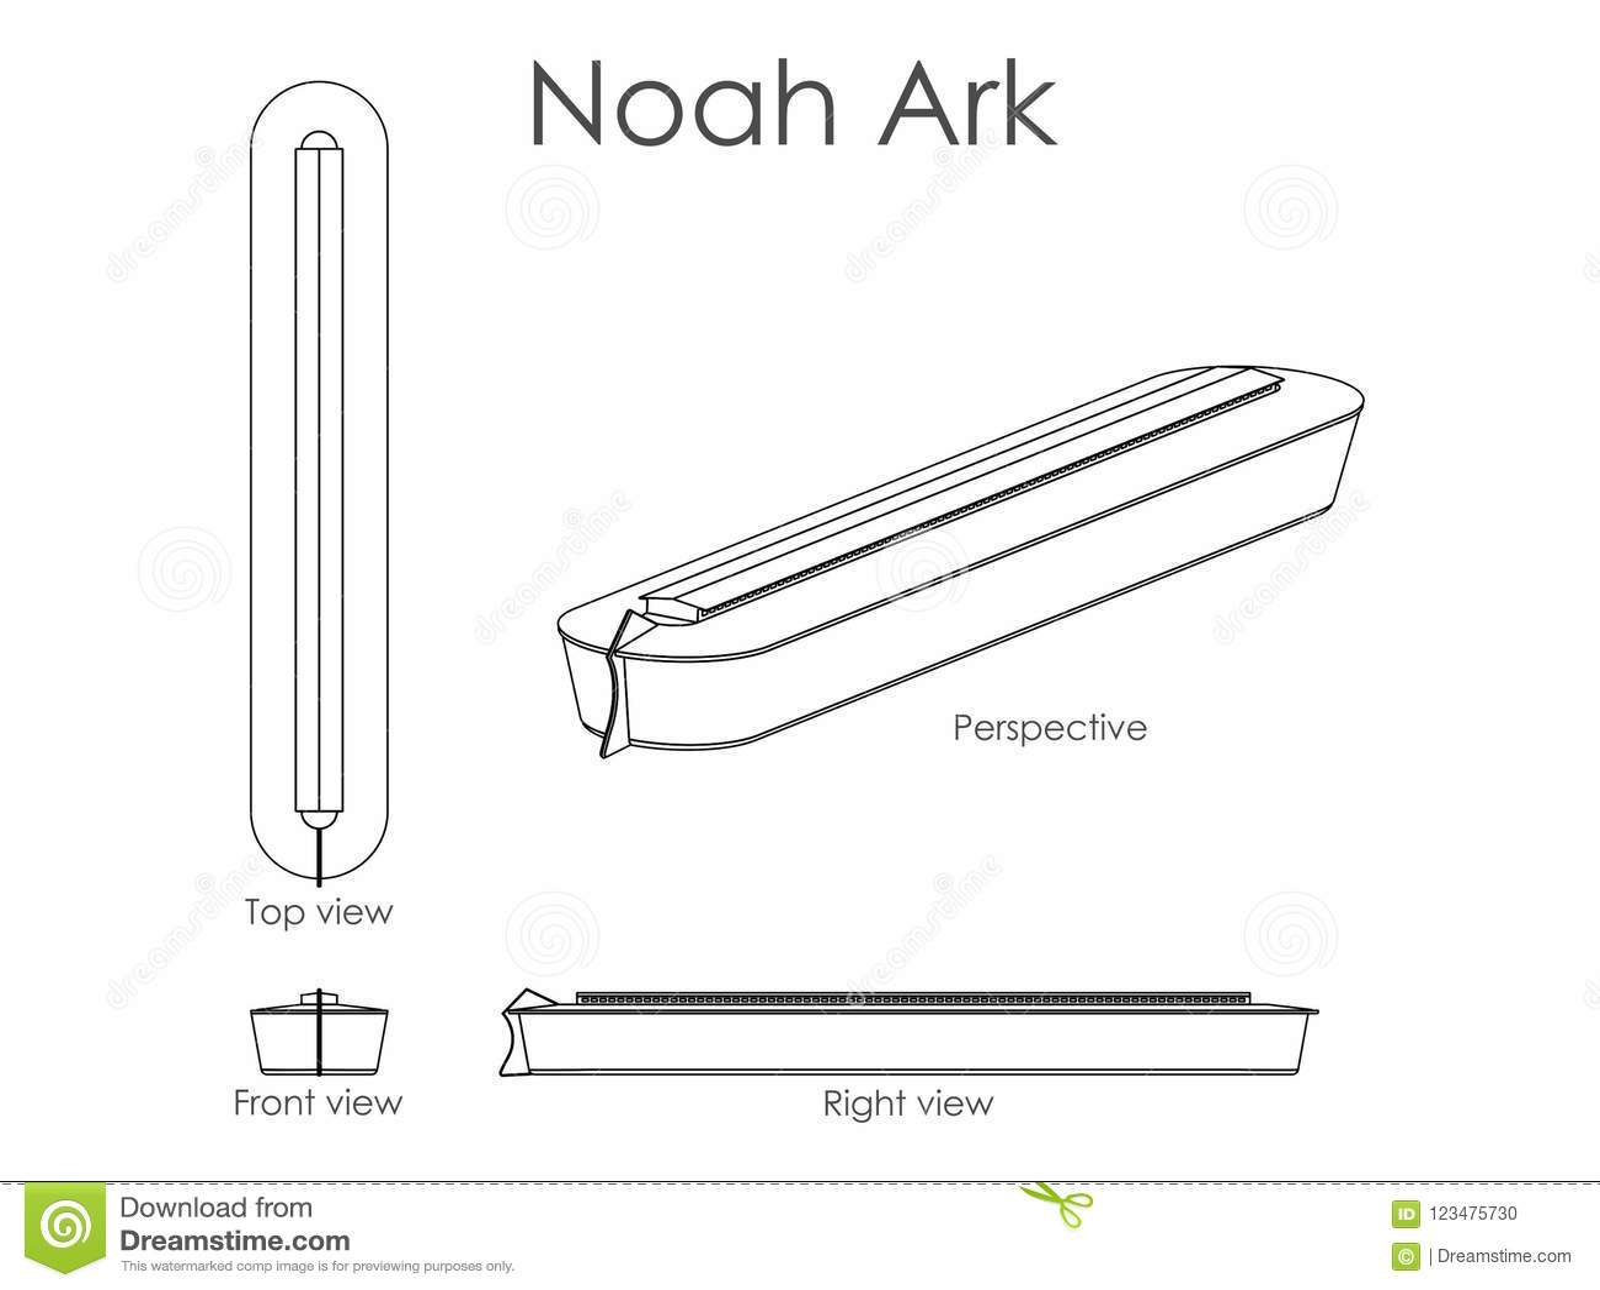 Noah Ark outline only